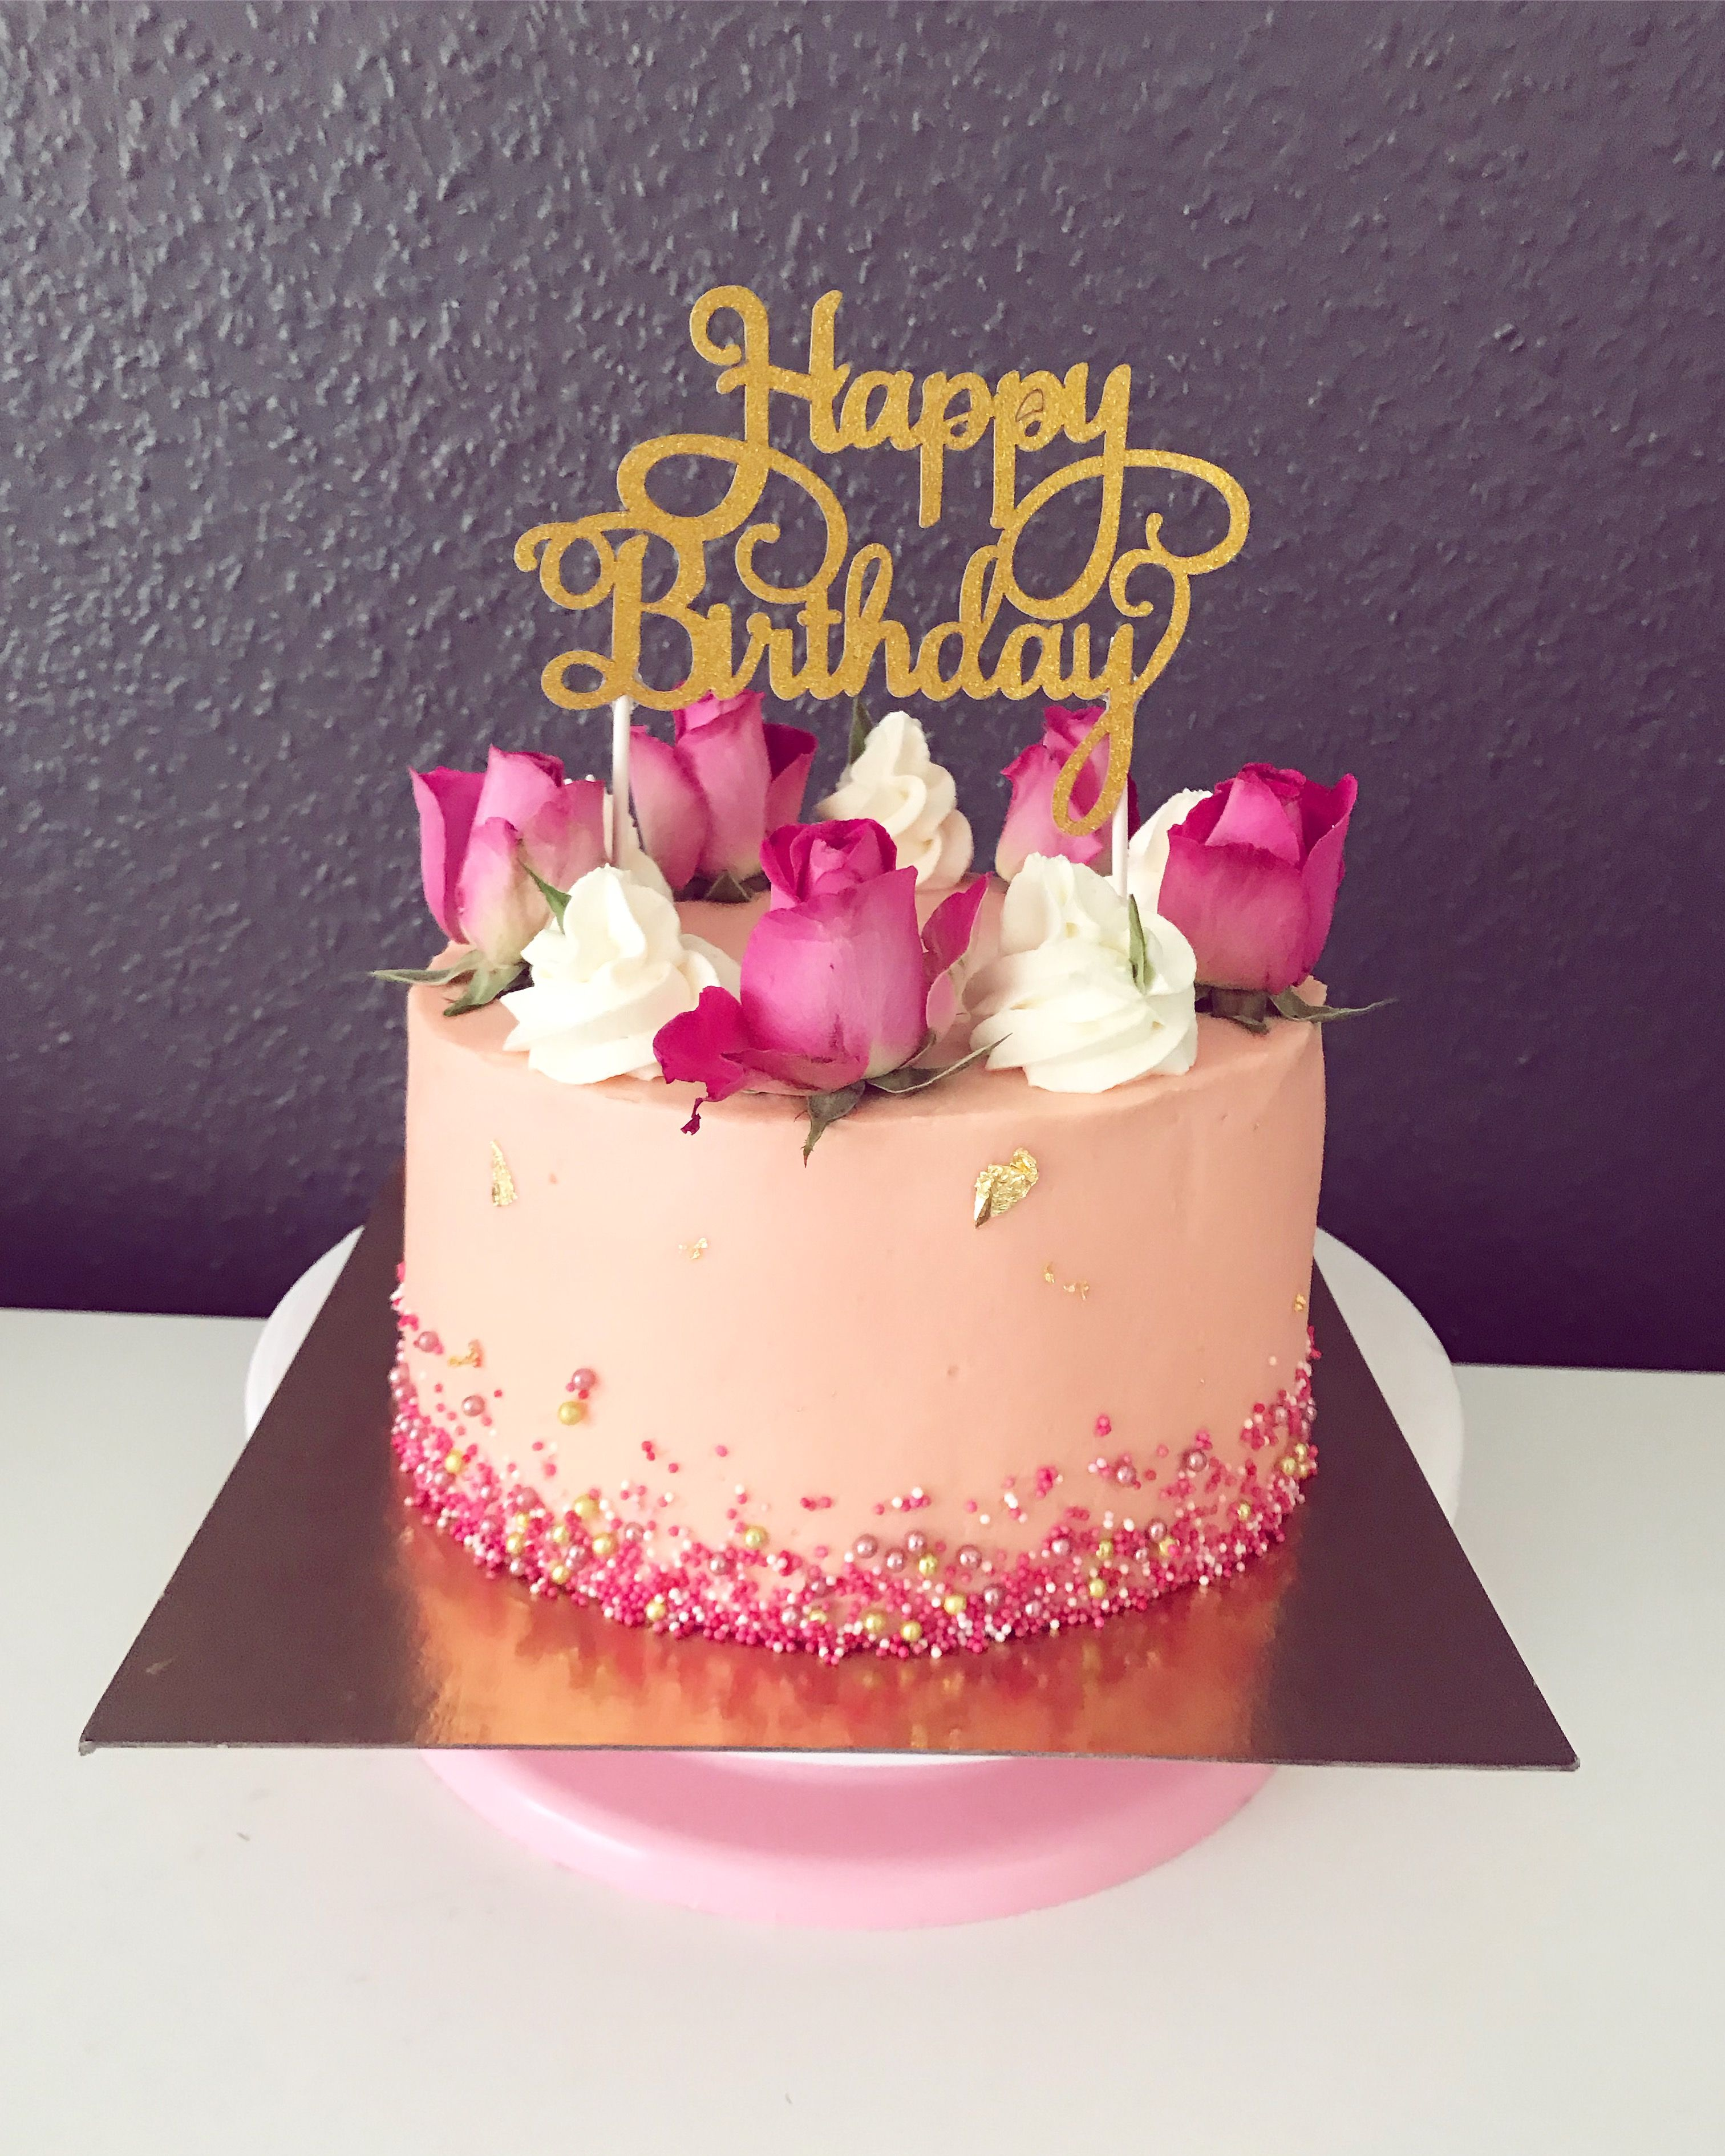 Awe Inspiring Birthday Cake Buttercream Cream Cake Decorating Roses And Funny Birthday Cards Online Alyptdamsfinfo